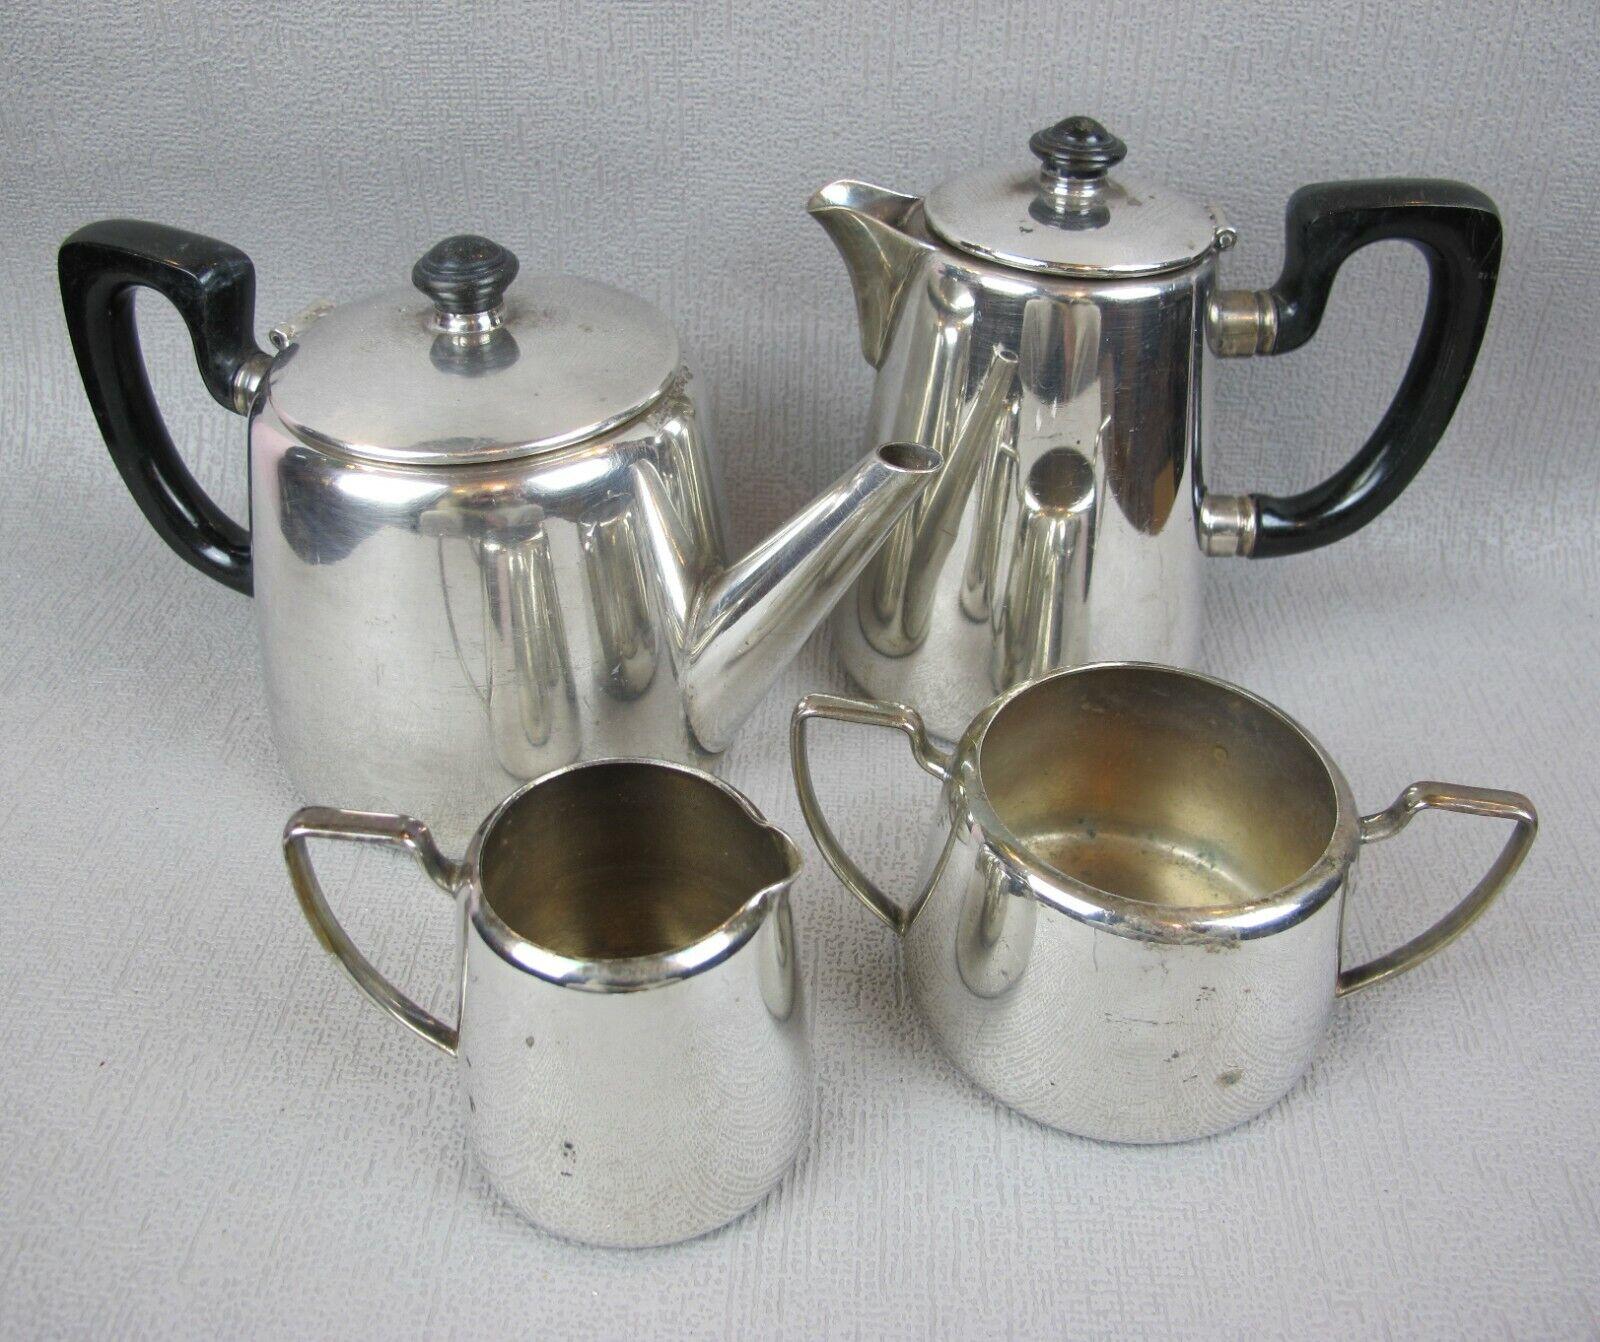 Superb vintage hotel style Elkington silver plated Tea Set Teapot Coffee Pot etc